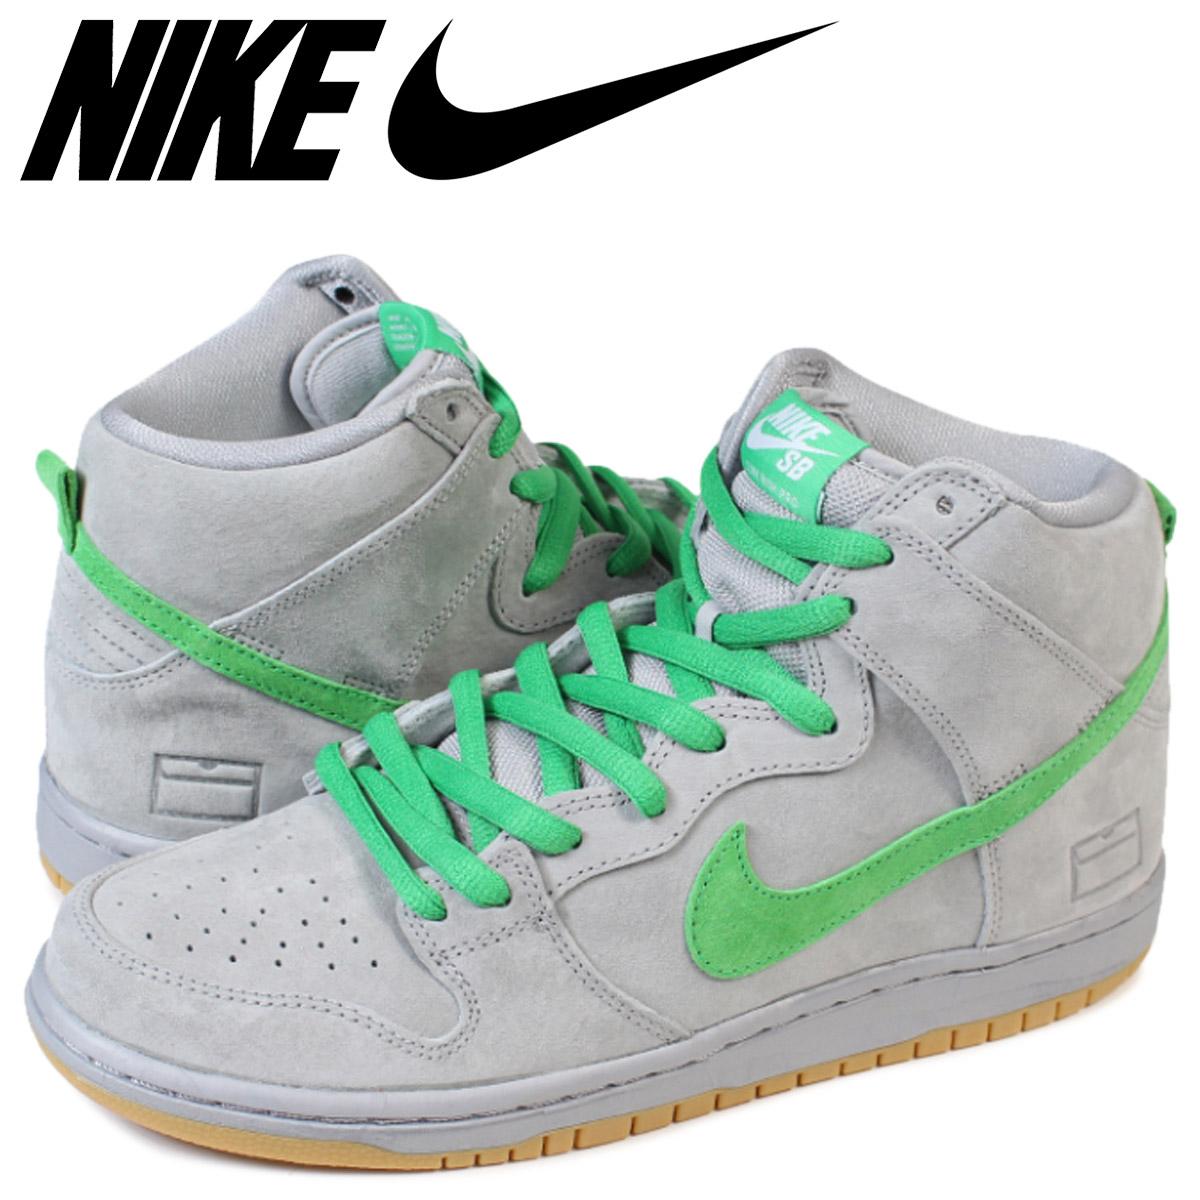 size 40 b0cc5 c578d NIKE SB Nike dunk sneakers men DUNK HIGH SILVERBOX 313,171-039 silver ...